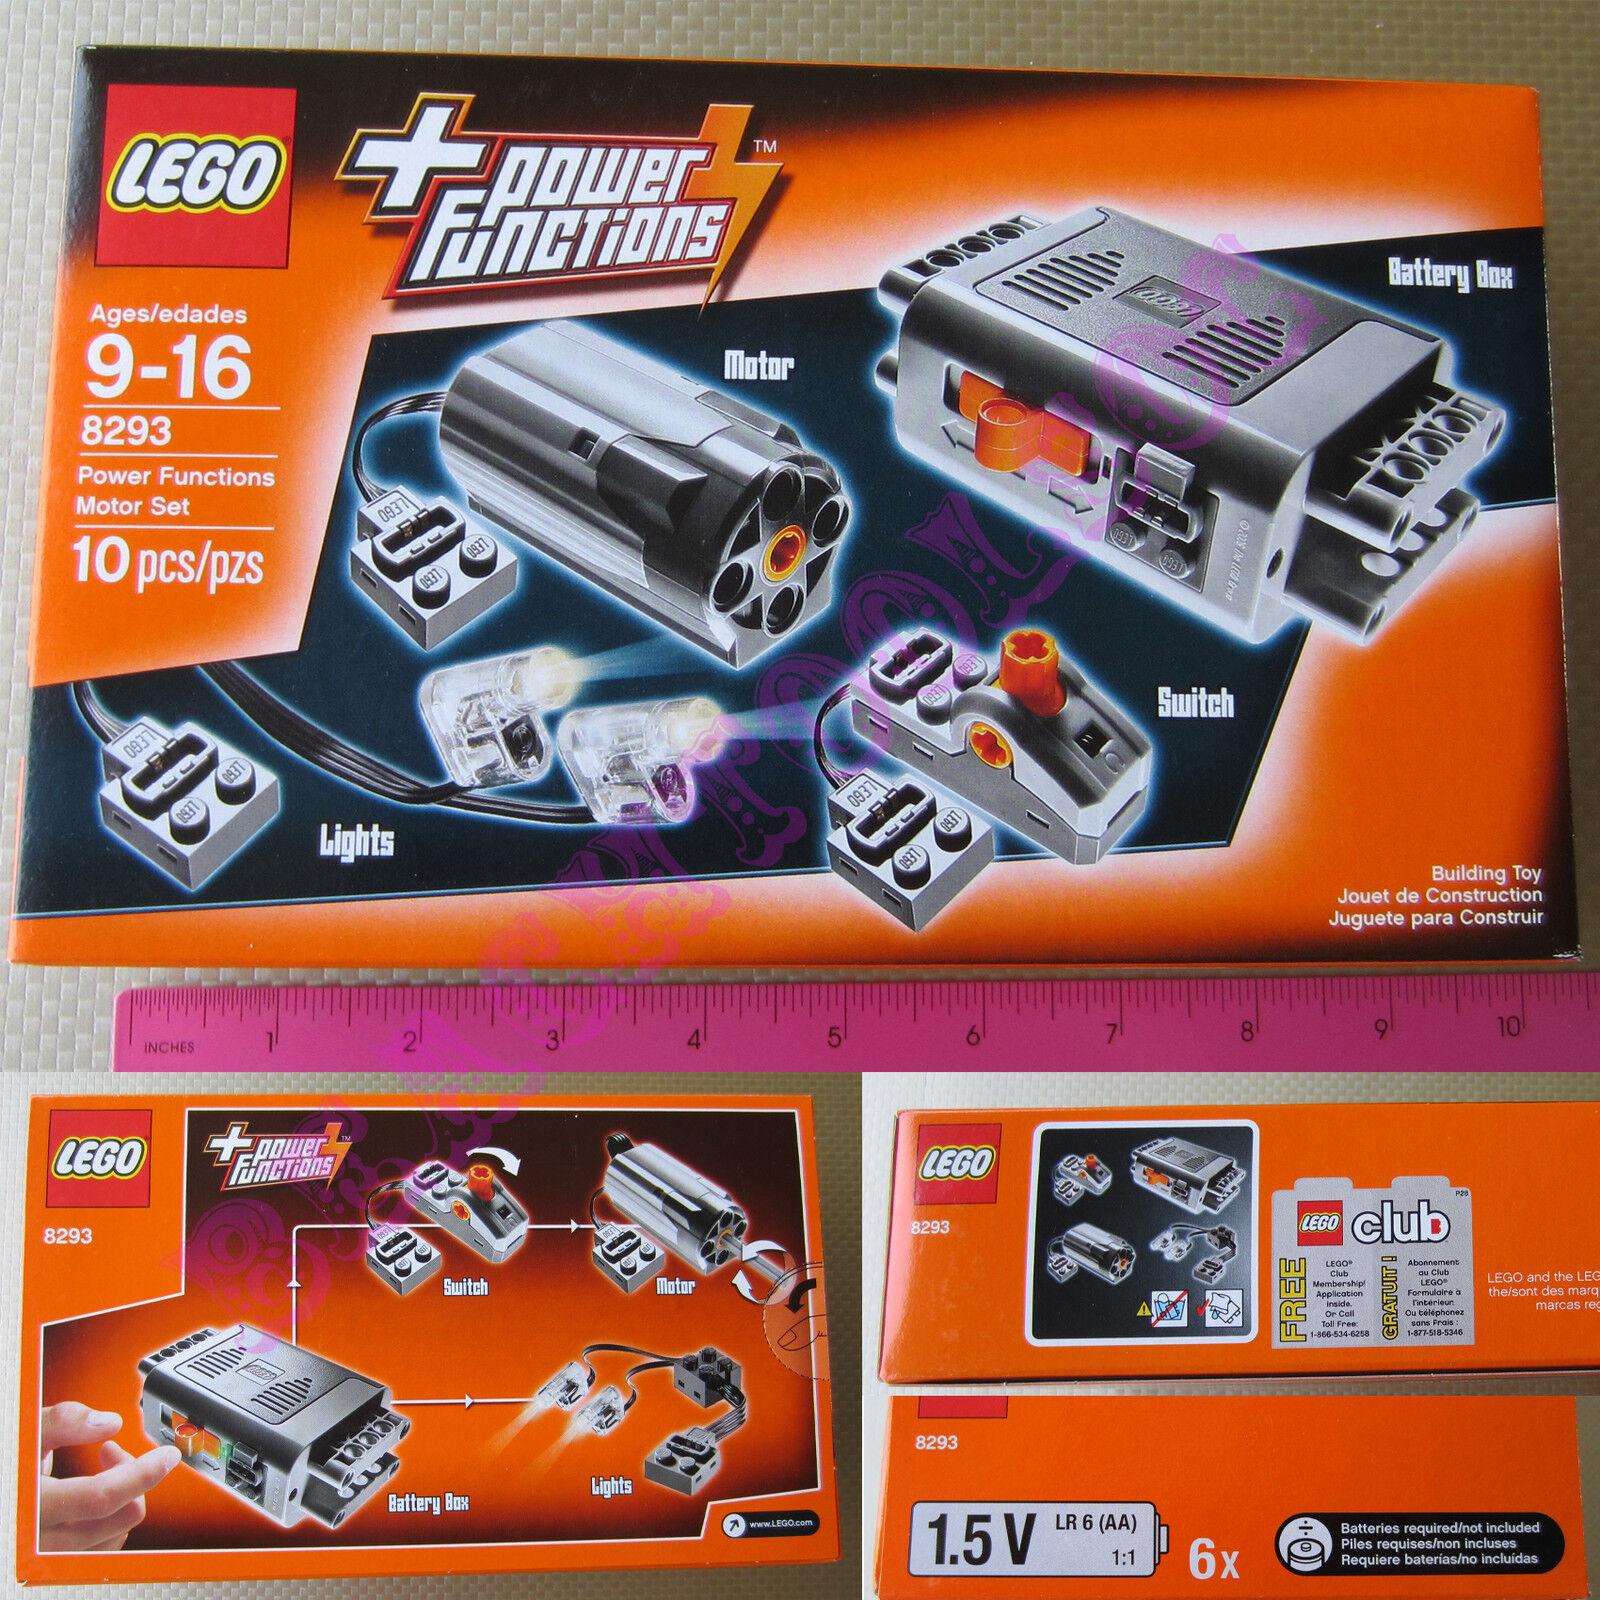 New LEGO TECHNIC Power Functions Motor Accessory Set 8293 - Battery Box M-Motor